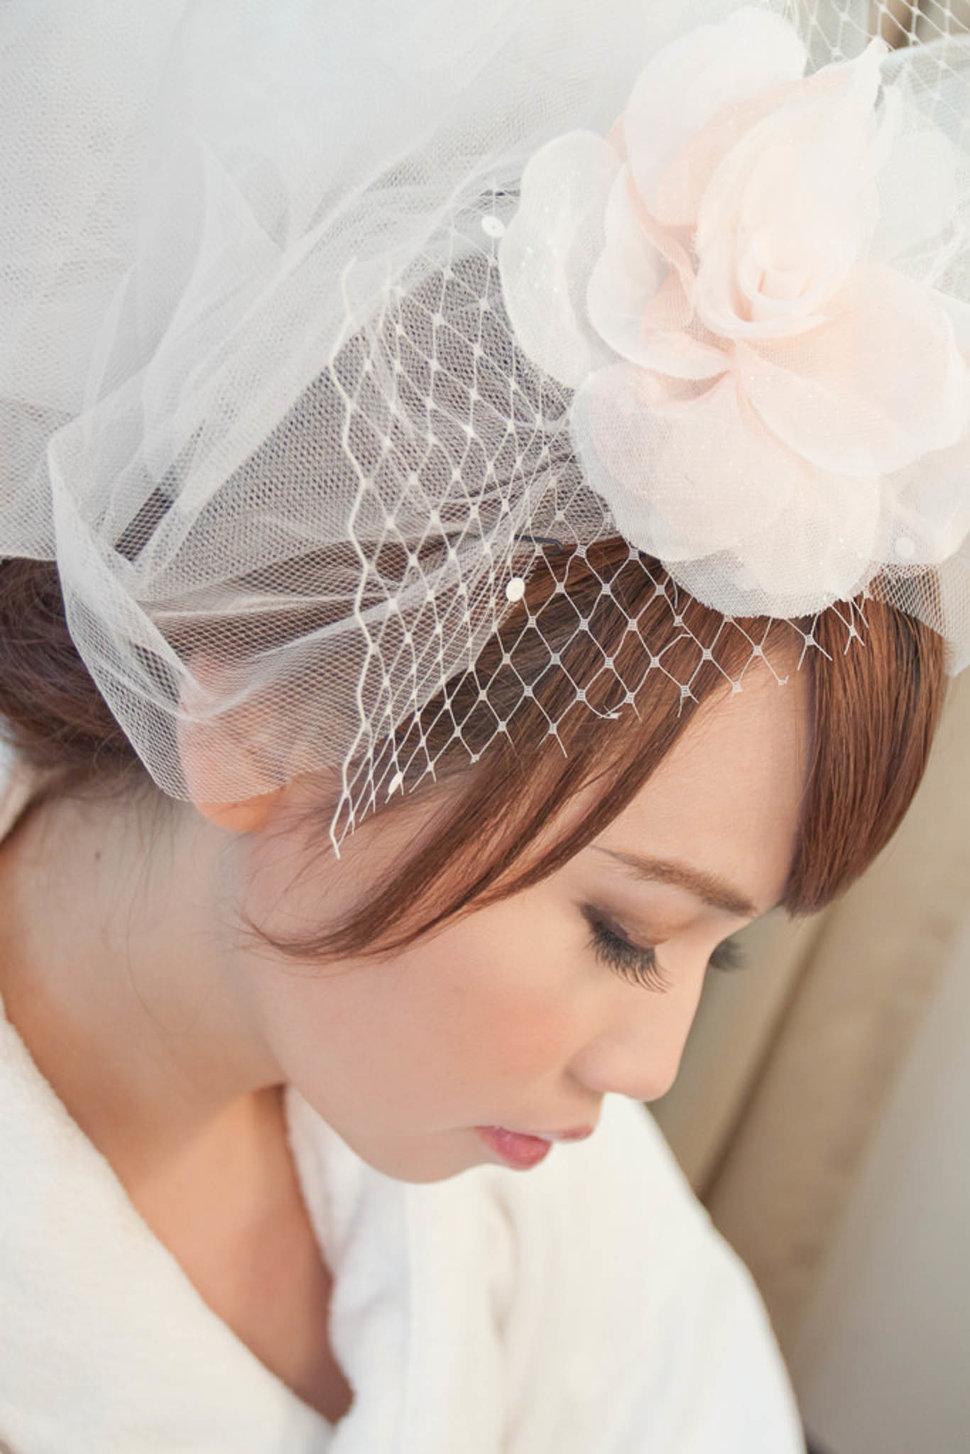 18PHOTO-佳成❤️ 玨萍(編號:220166) - 18PHOTO 婚紗影像攝影工作室 - 結婚吧